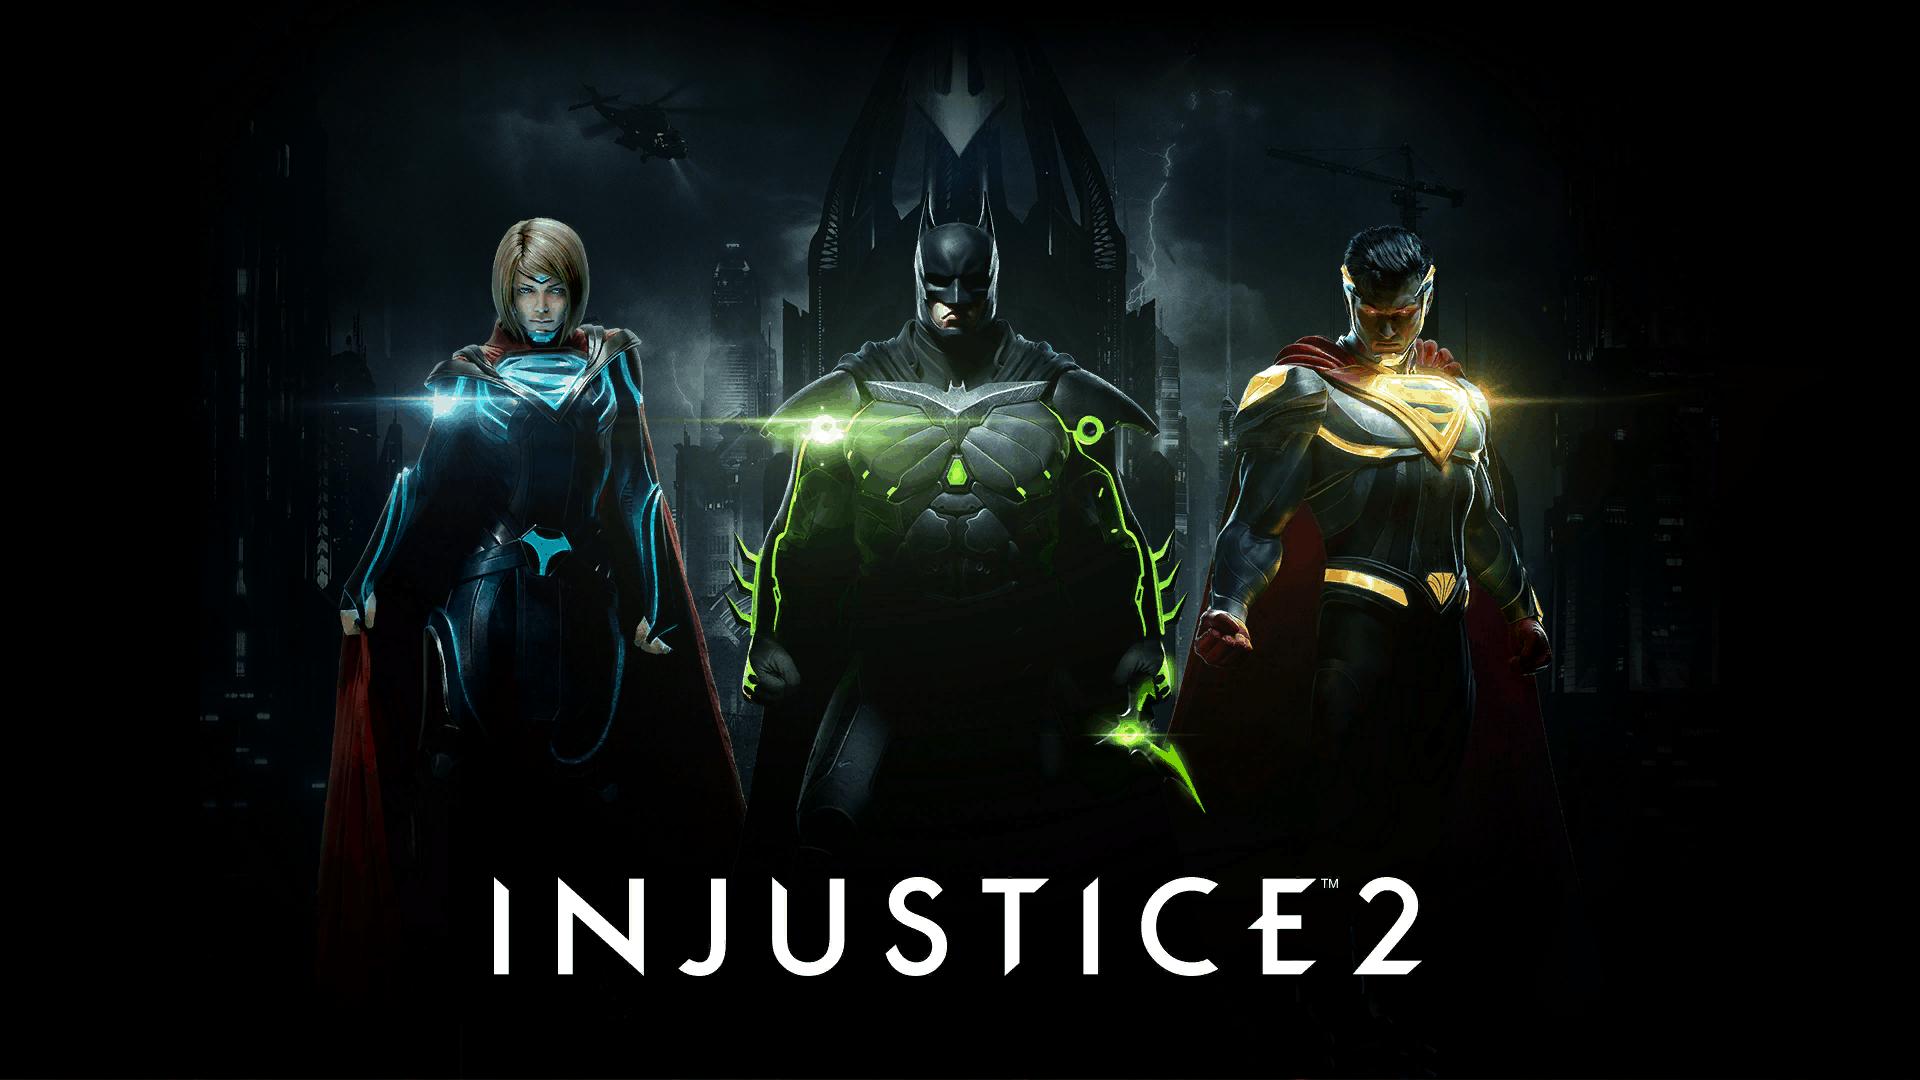 Best Fighting Games - Injustice 2